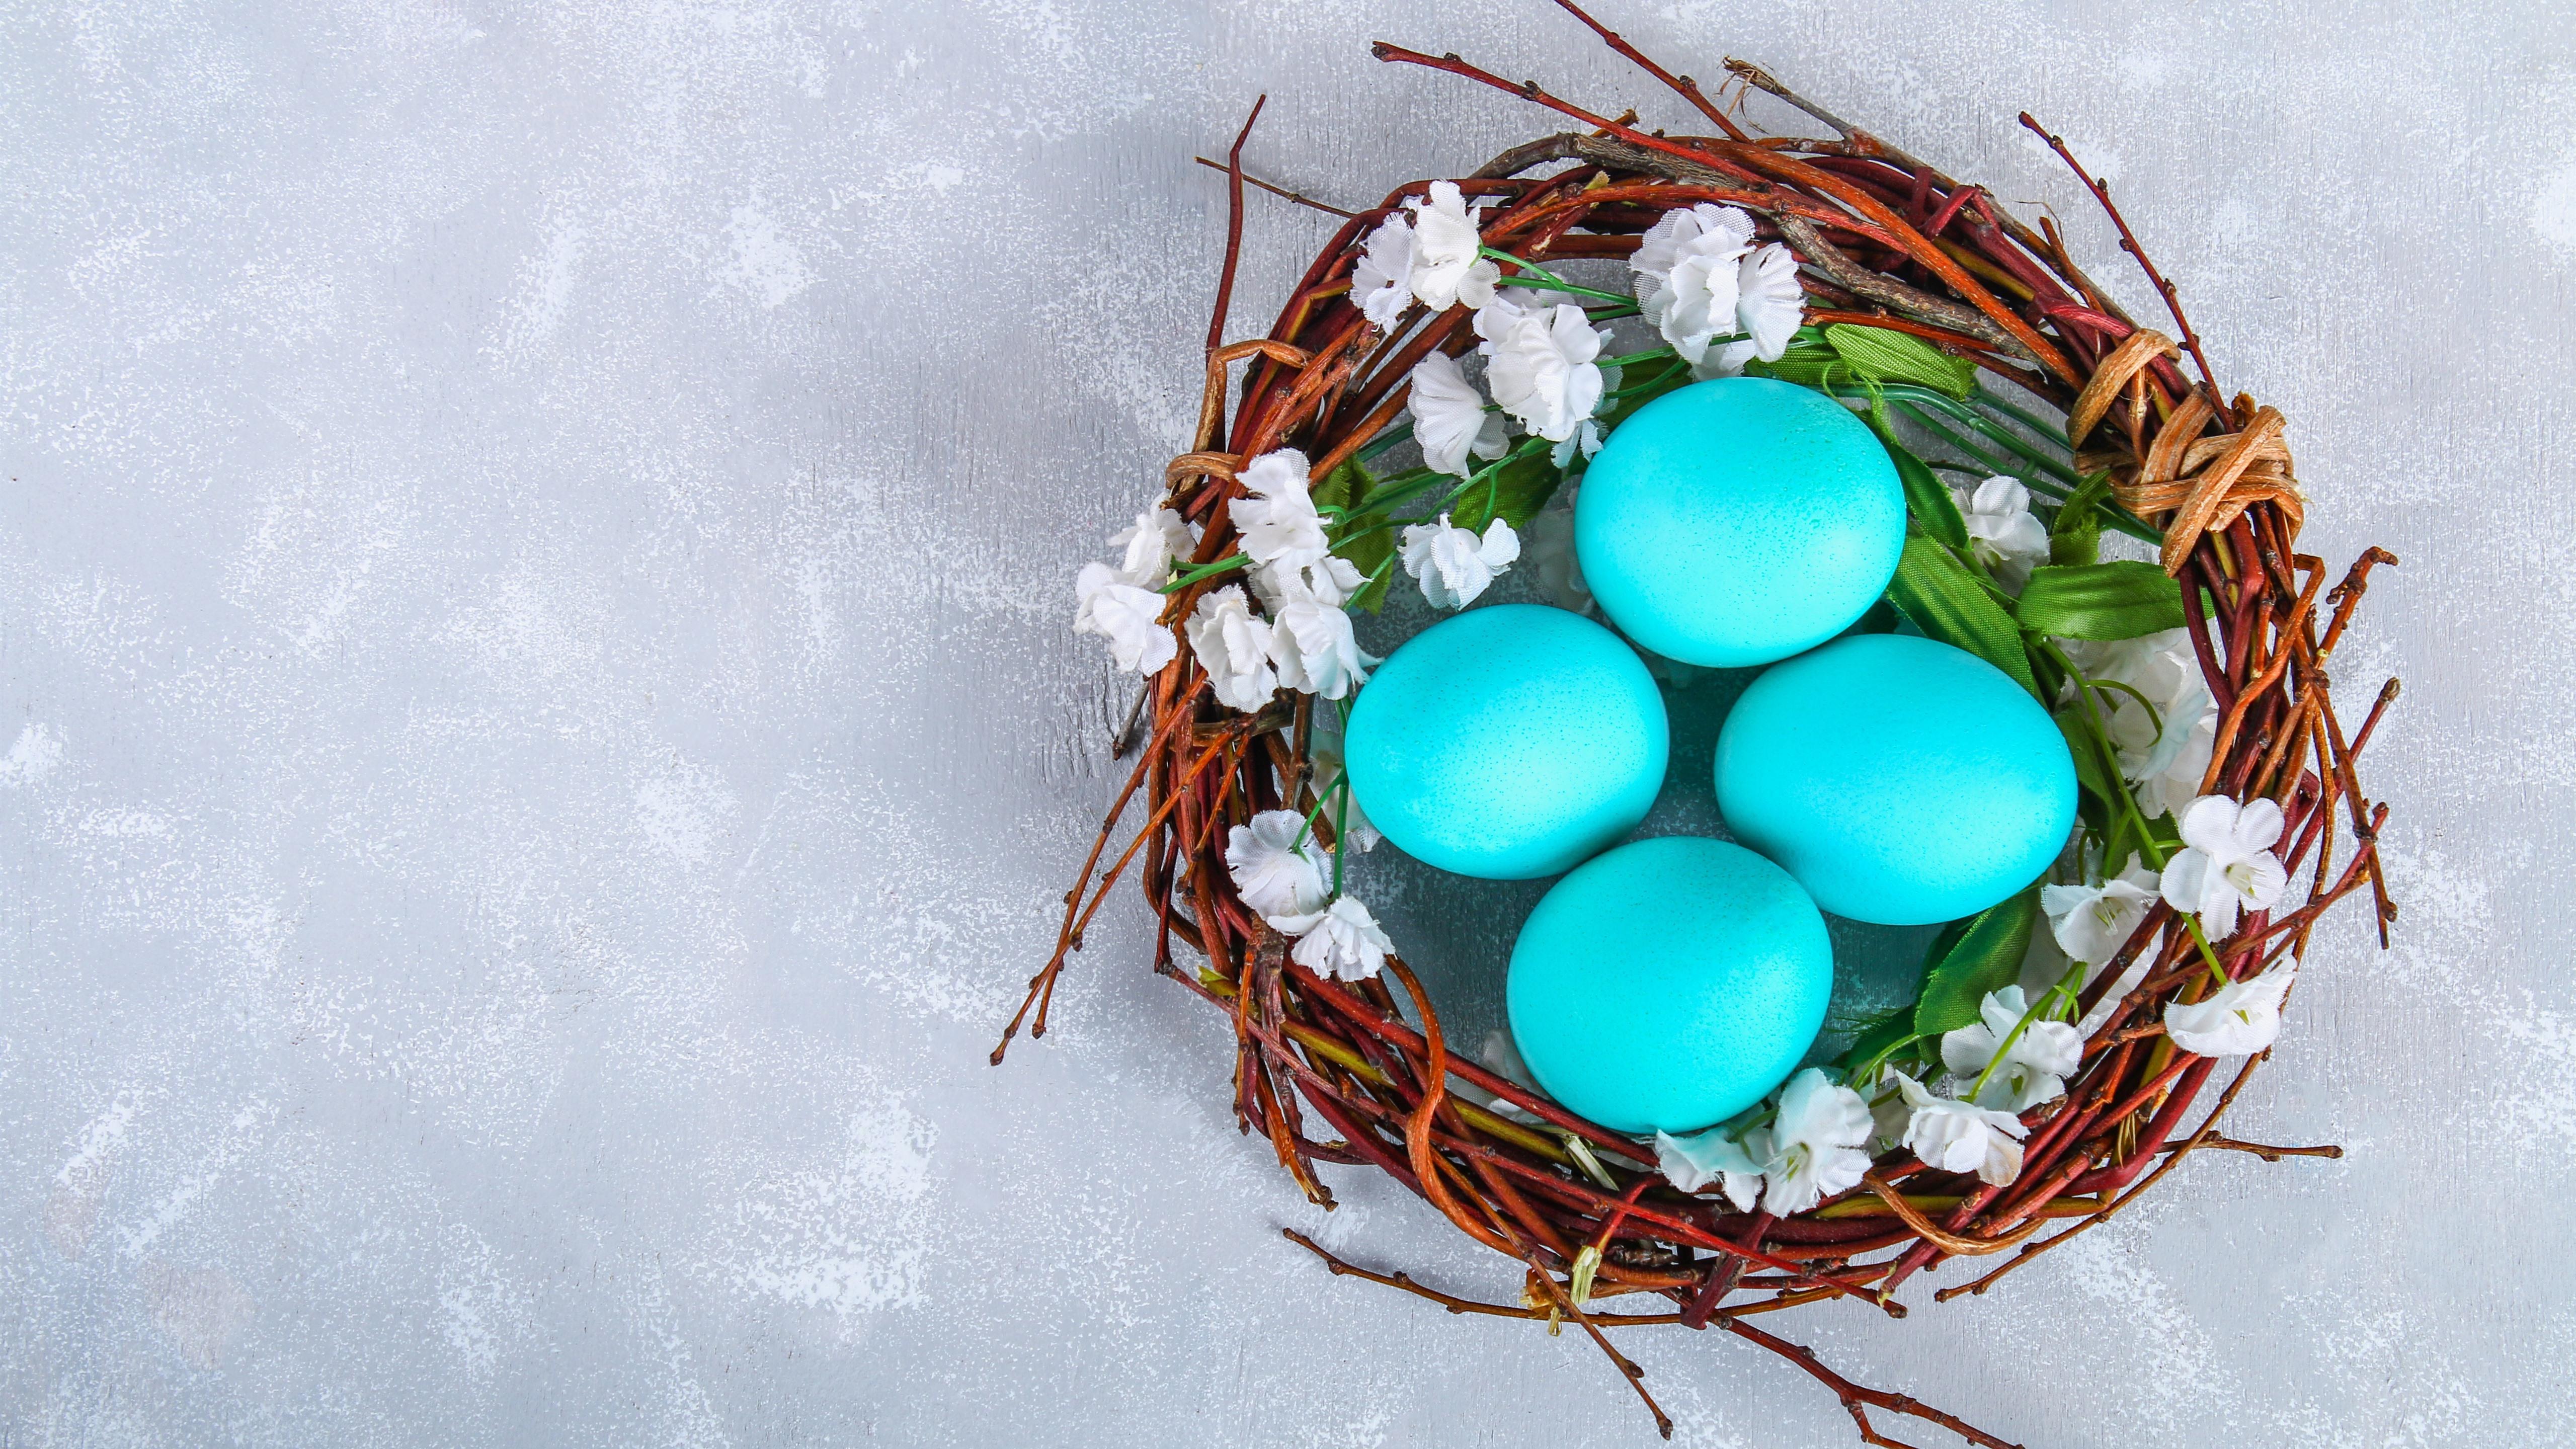 Wallpaper Blue Easter Eggs Nest 5120x2880 Uhd 5k Picture Image